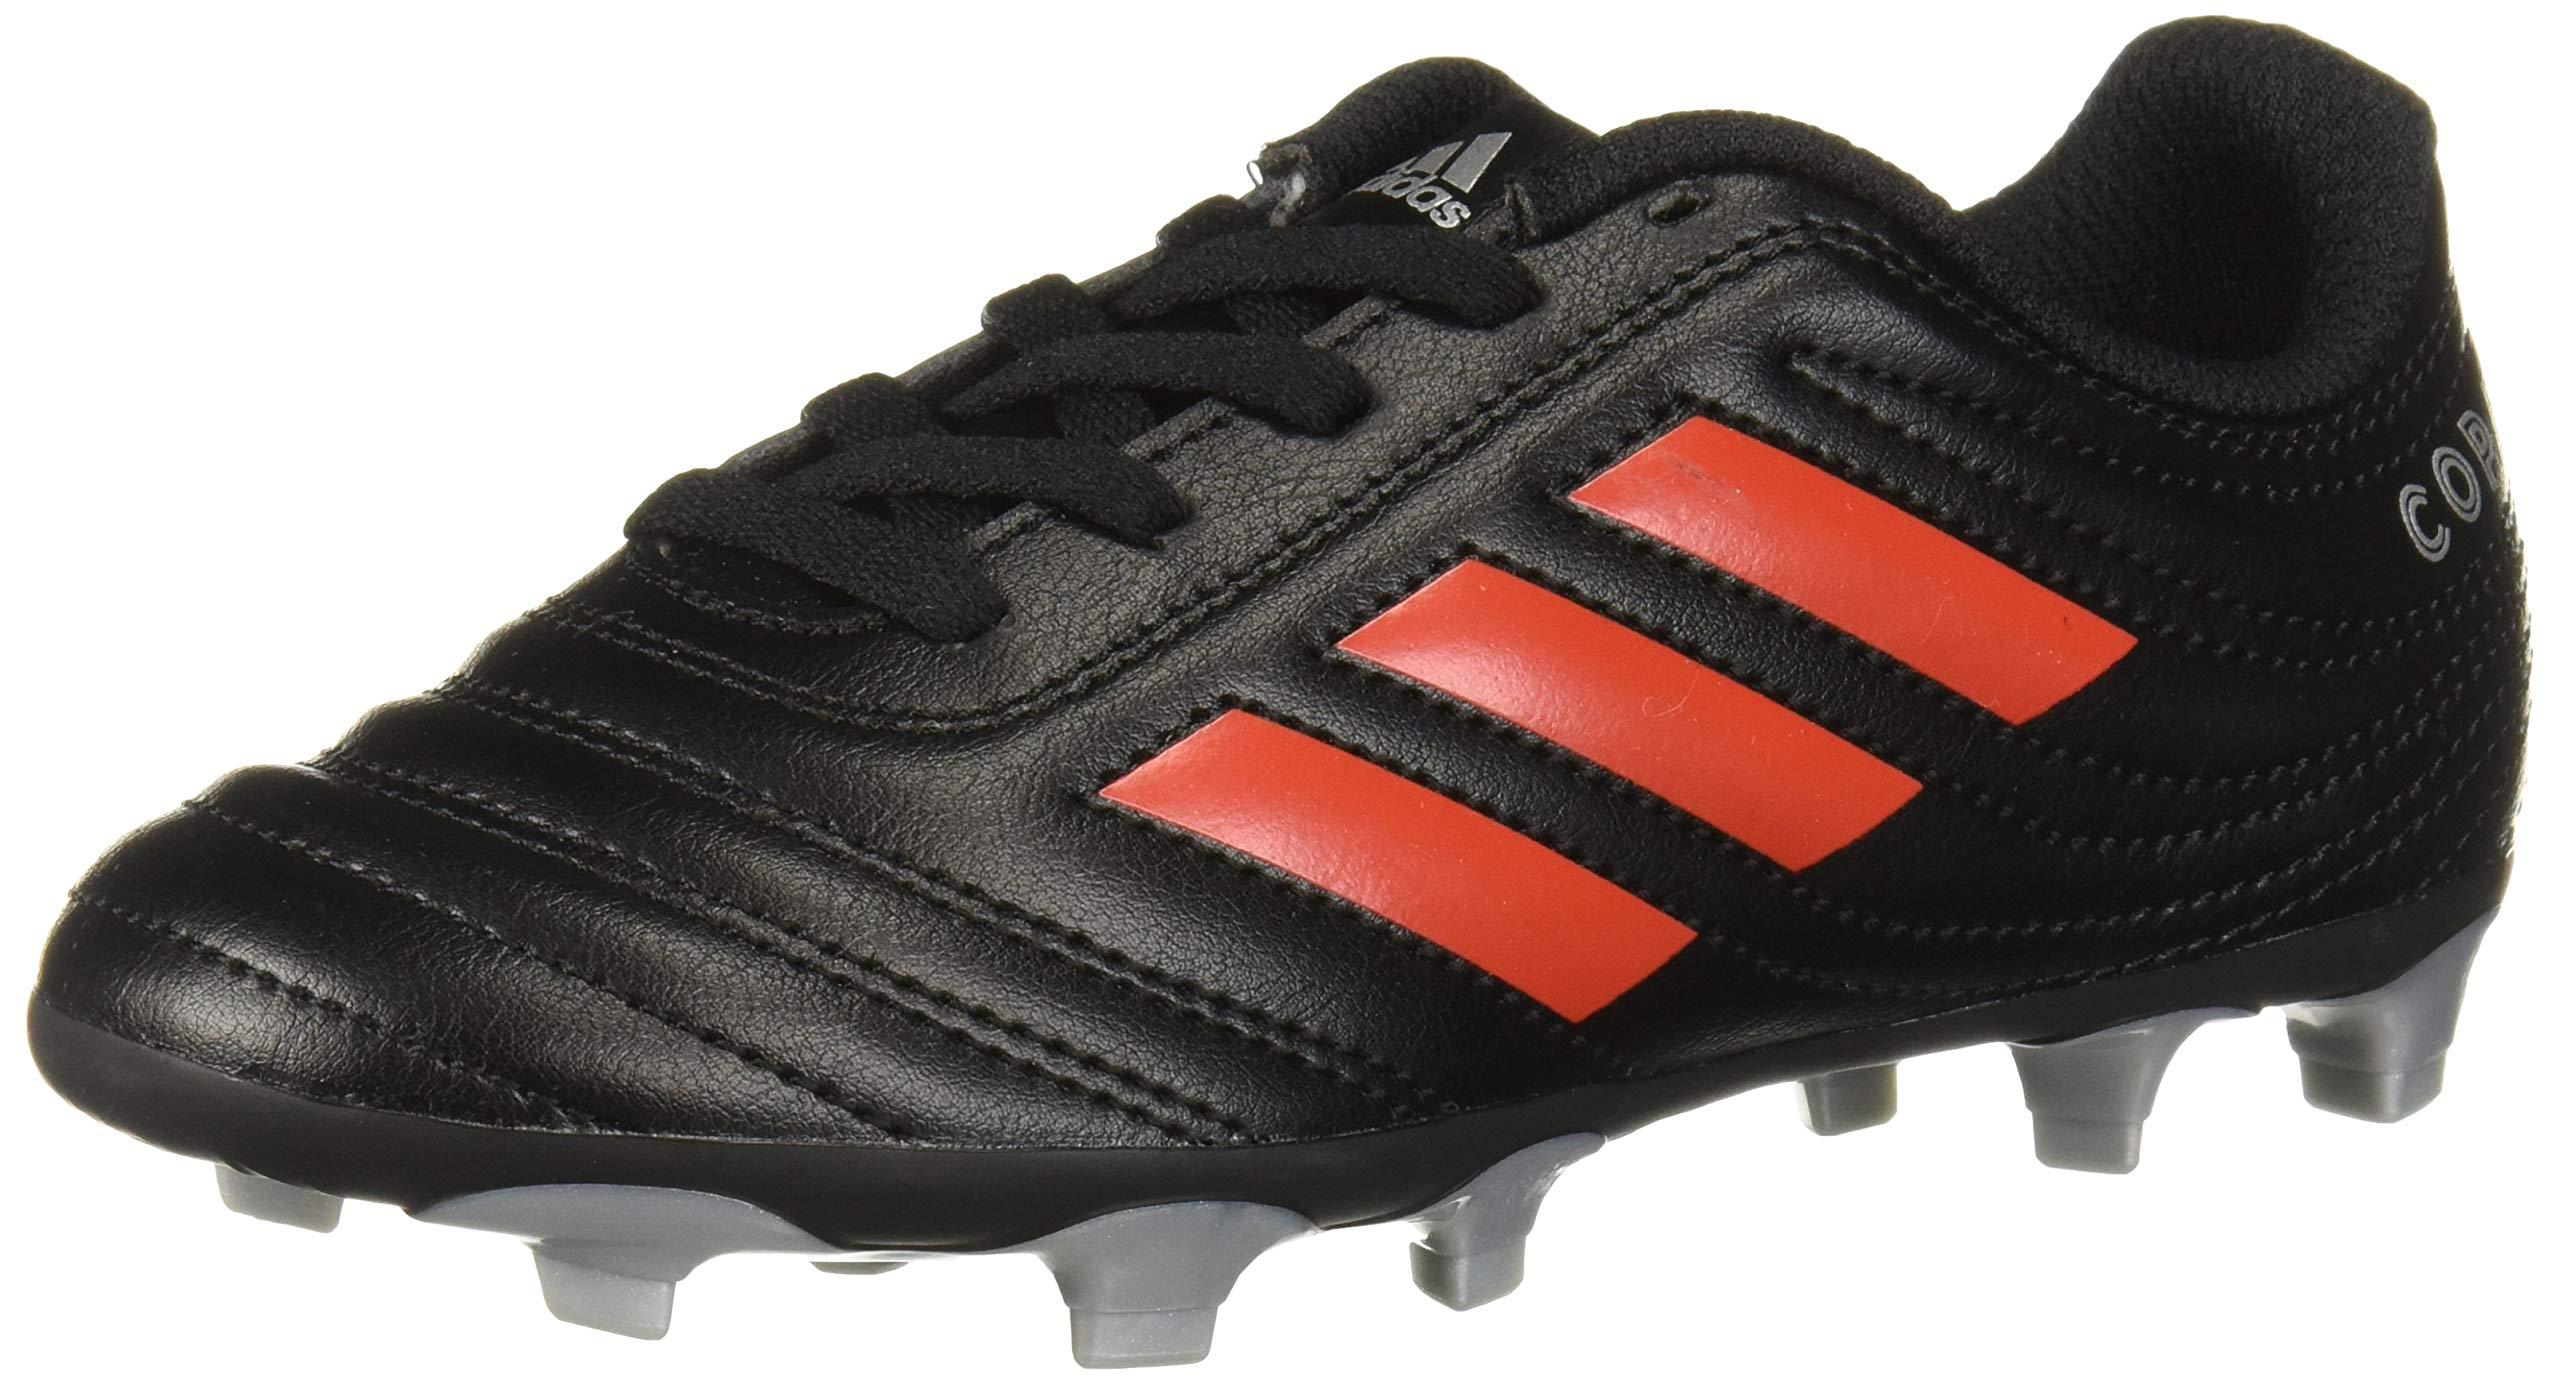 adidas Unisex Copa 19.4 Firm Ground Soccer Shoe Black/hi-res red/Silver Metallic 5.5 M US Big Kid